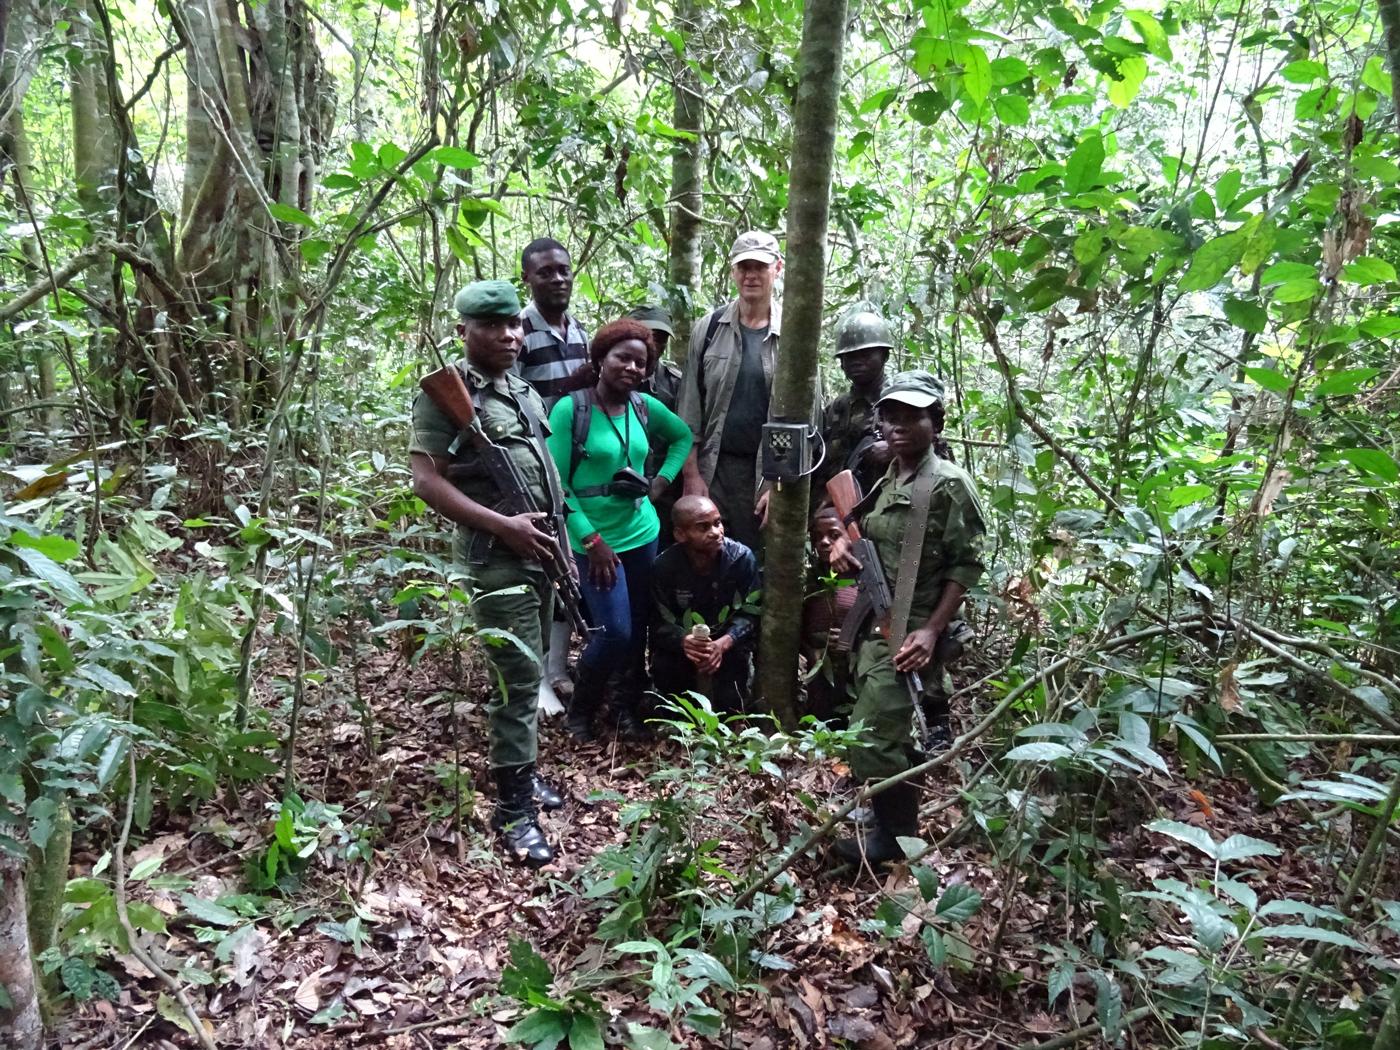 'Team Okapi' set up the initial phase of the camera trap study © Okapi Conservation Project